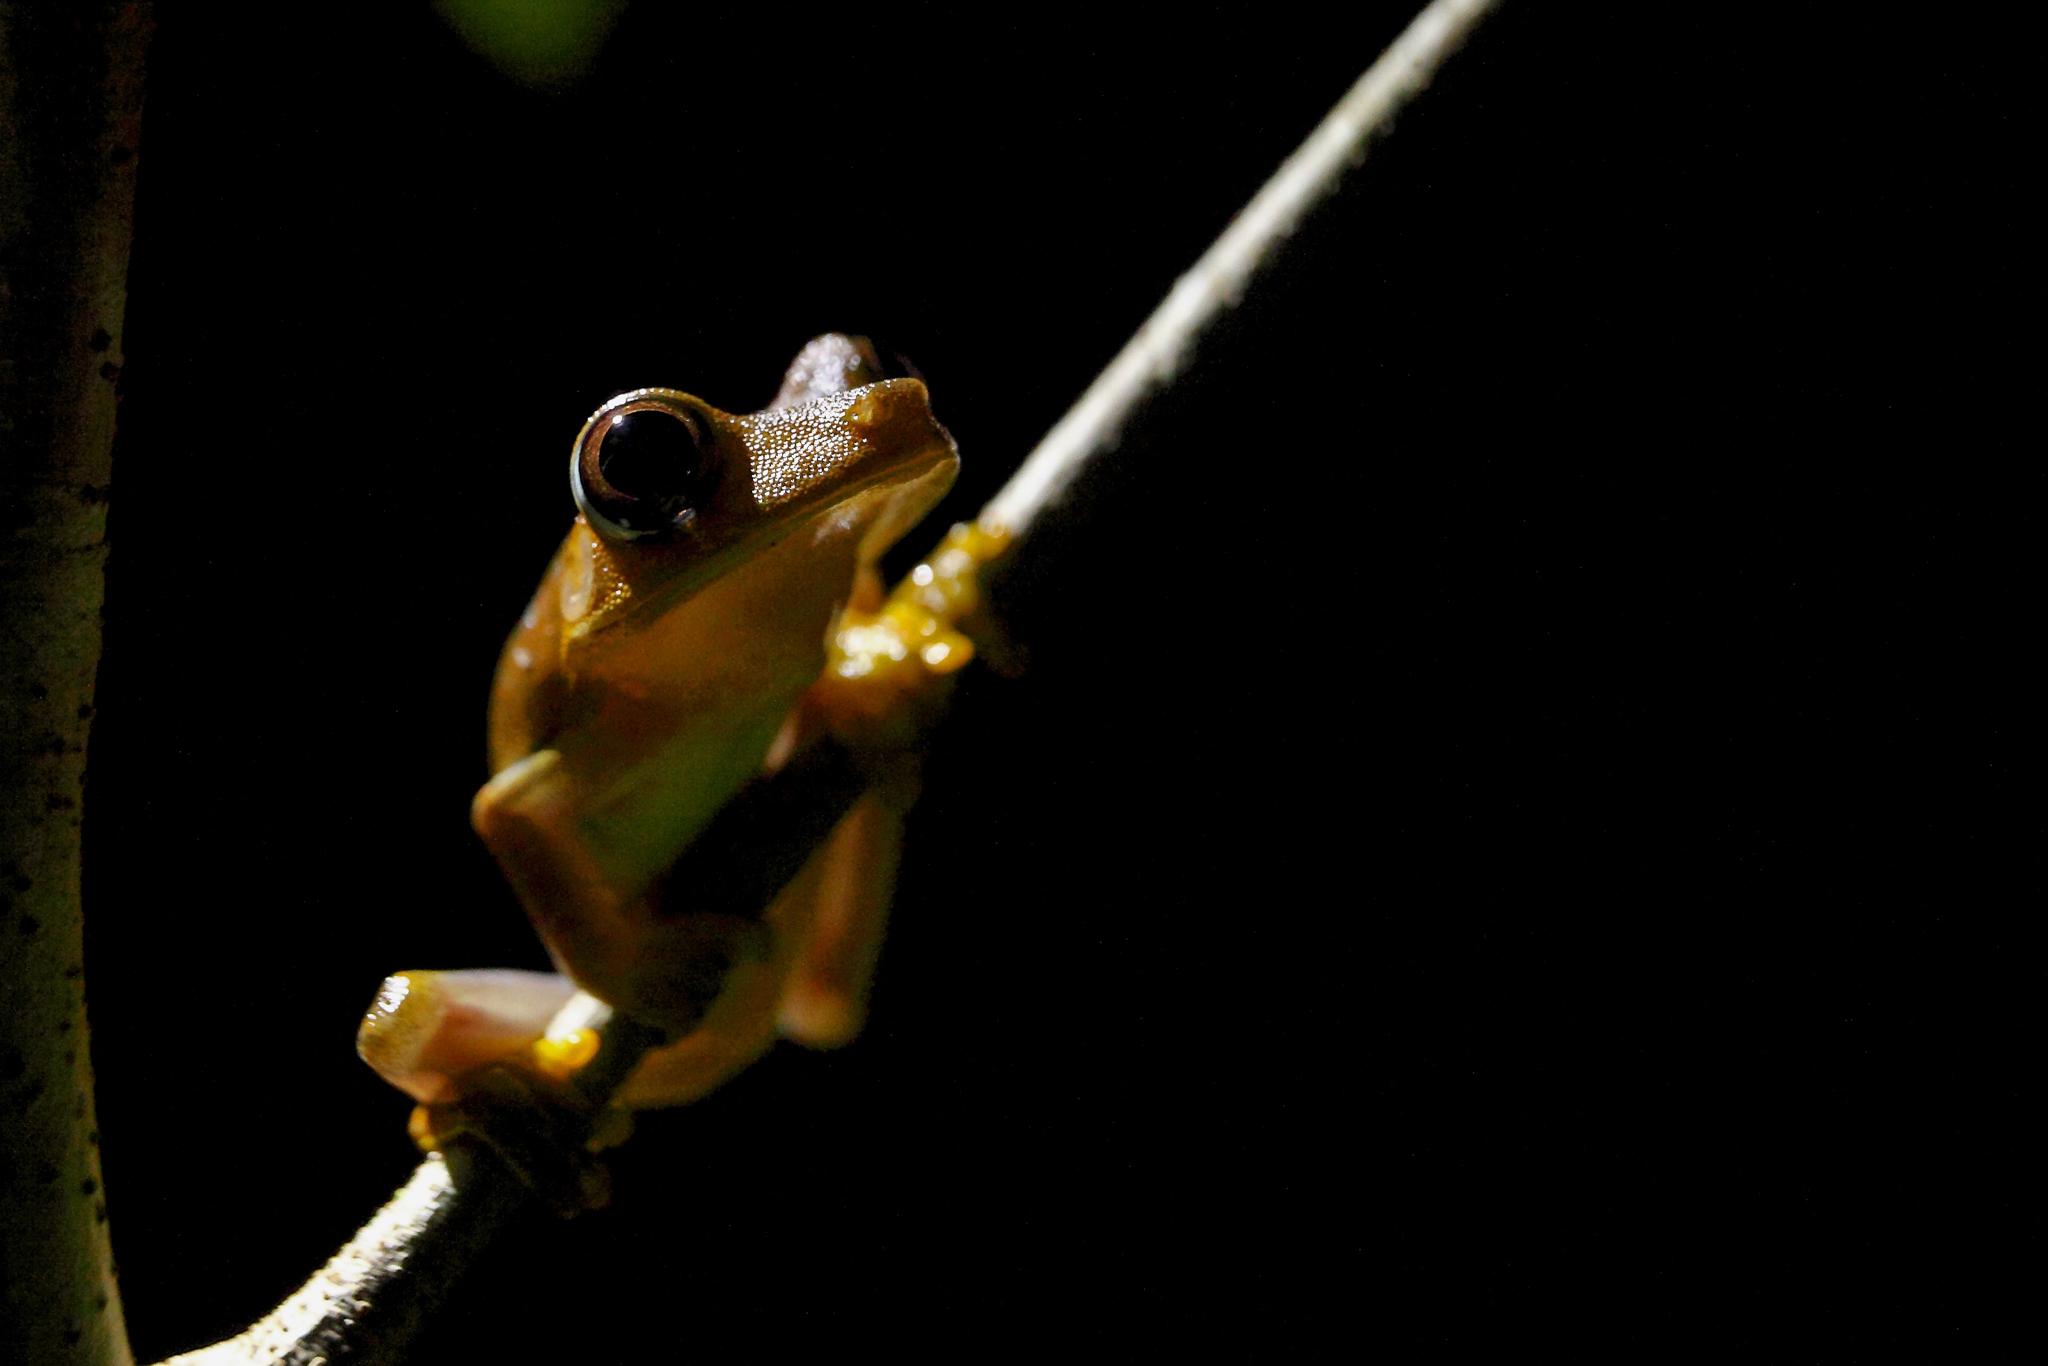 A tree frog (<em>Boana</em> sp) in the Amazon rainforest. Photograph by Rodrigo Baleia